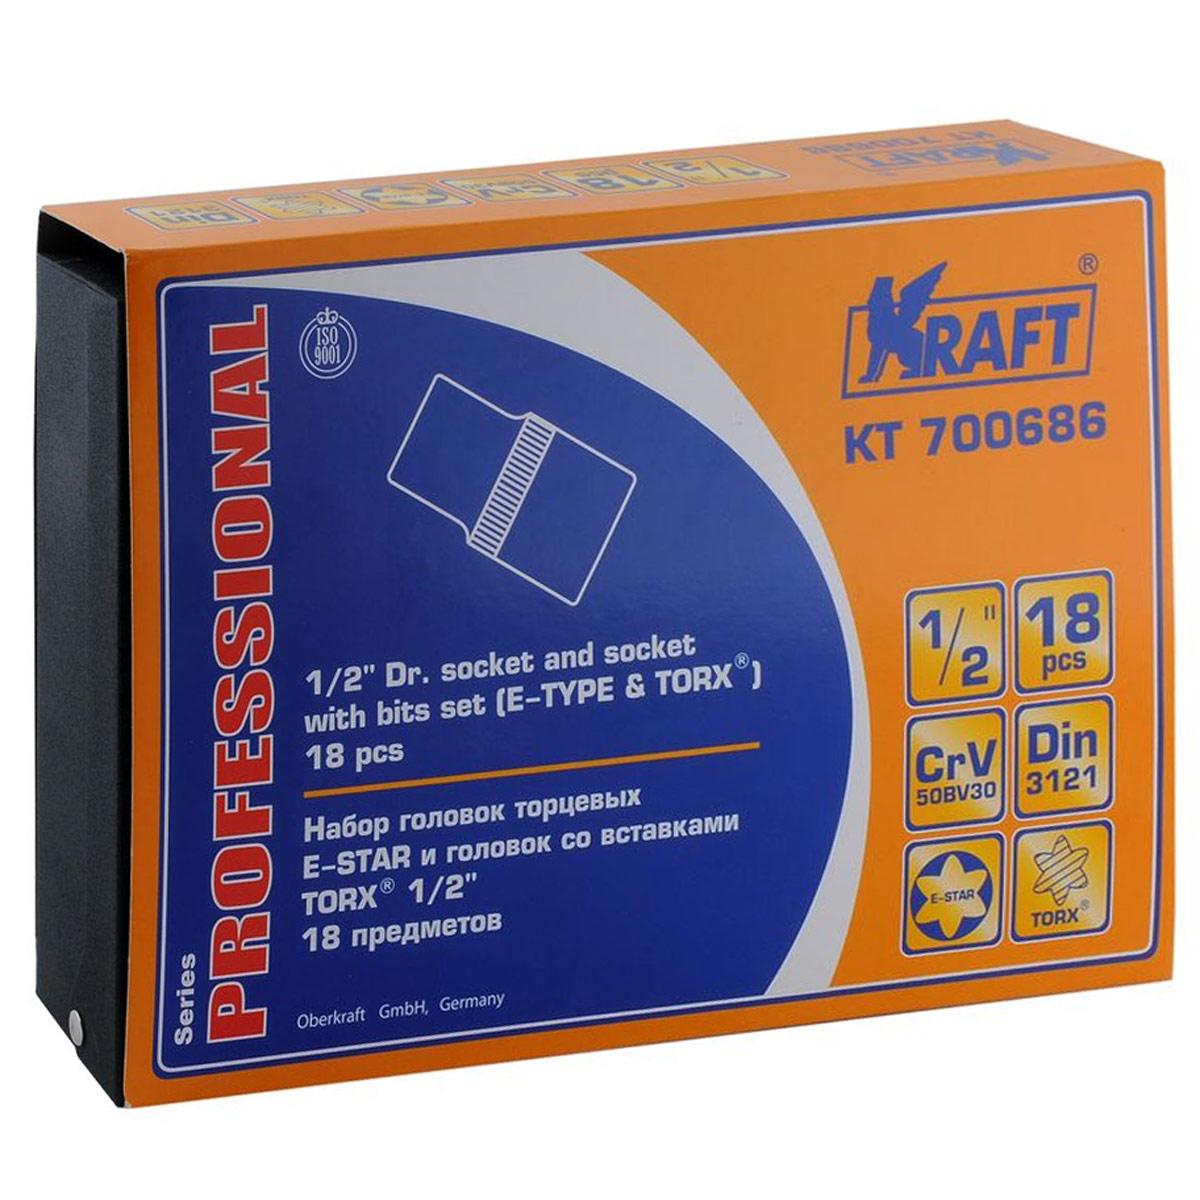 Набор торцевых головок Kraft Professional Е-star, со вставками Torx, 1/2, 18 предметов co e